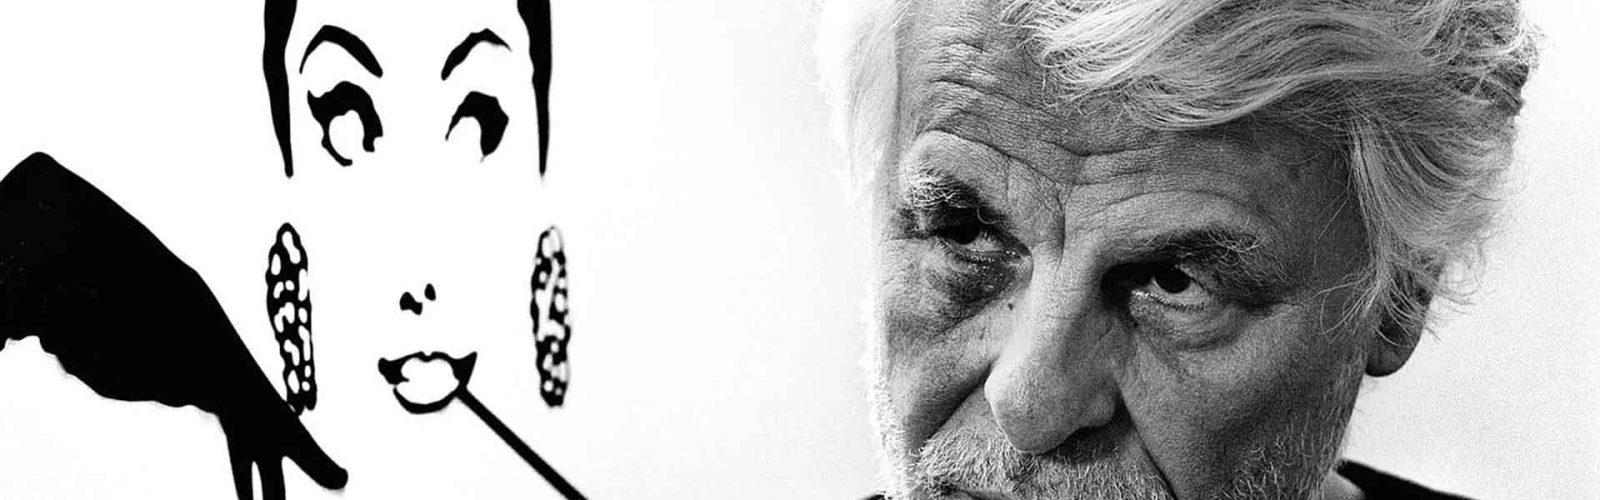 Michele Placido<br>legge <em>Il silenzio</em> di Edgar Lee Masters